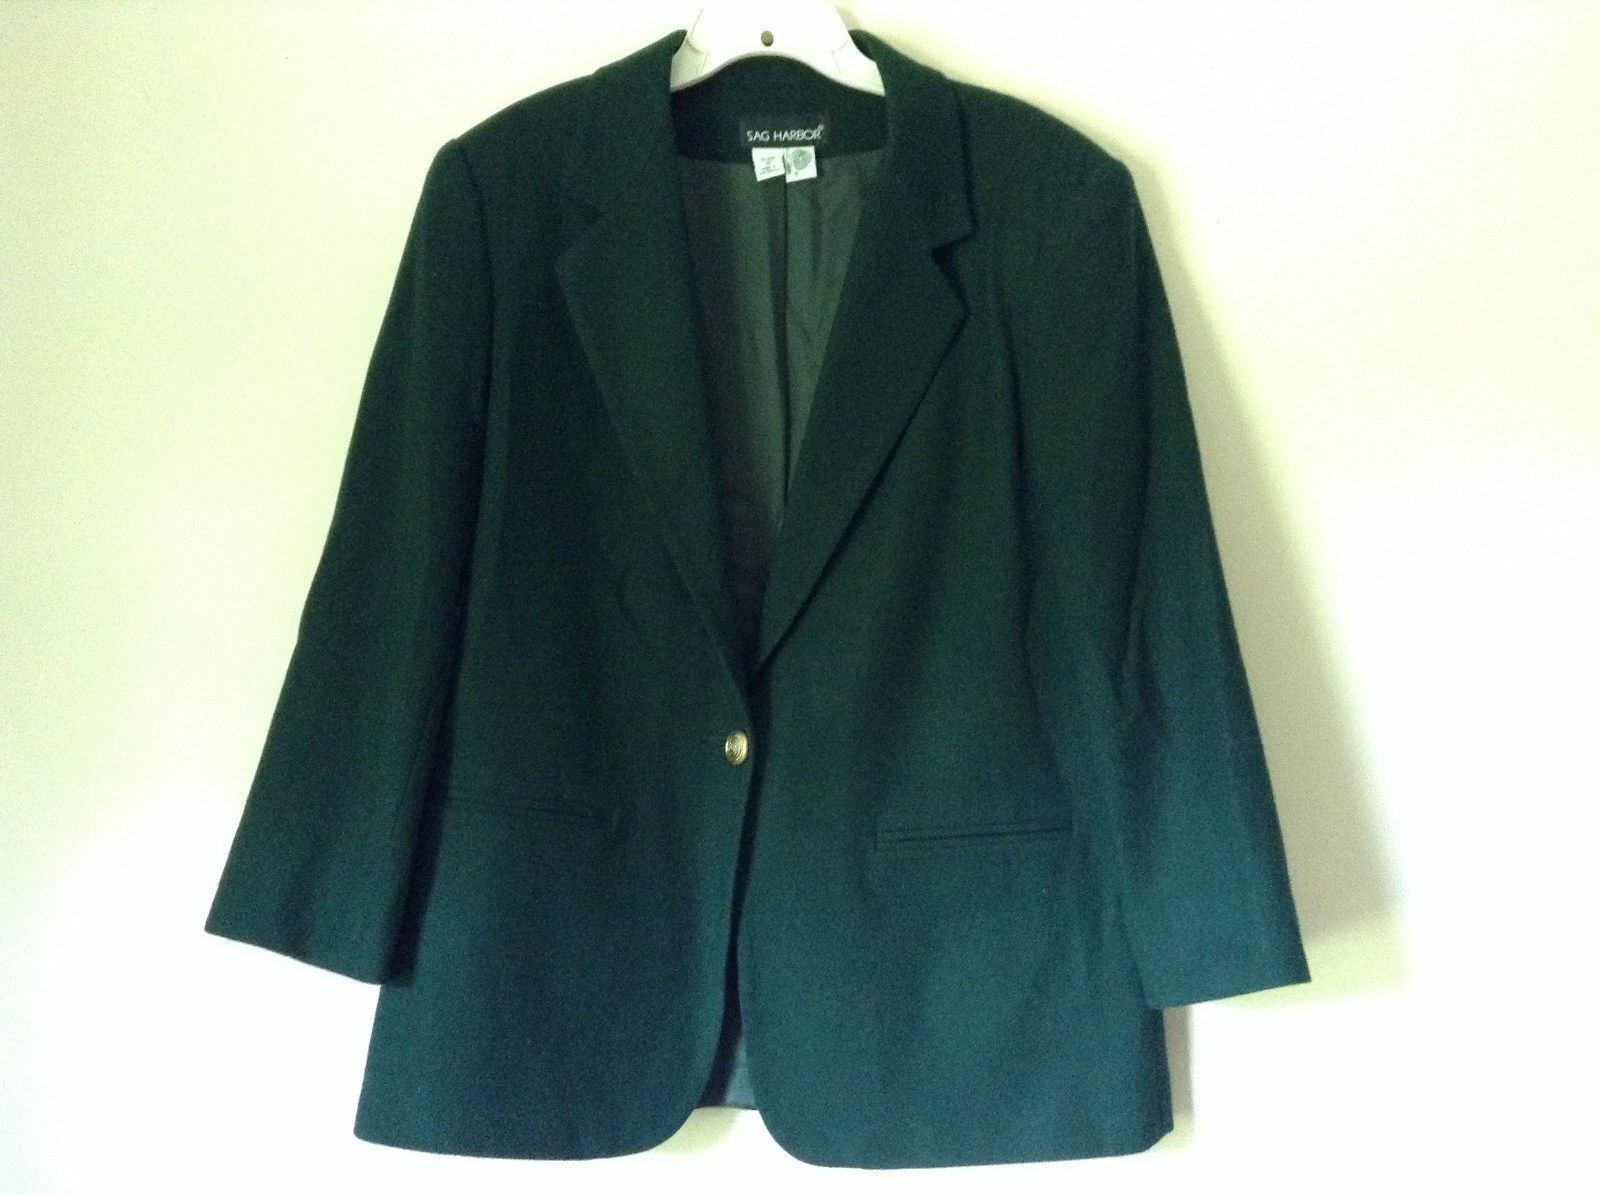 Dark Green Wool Suit Jacket Blazer by Sag Harbor Size 12 Shoulder Pads